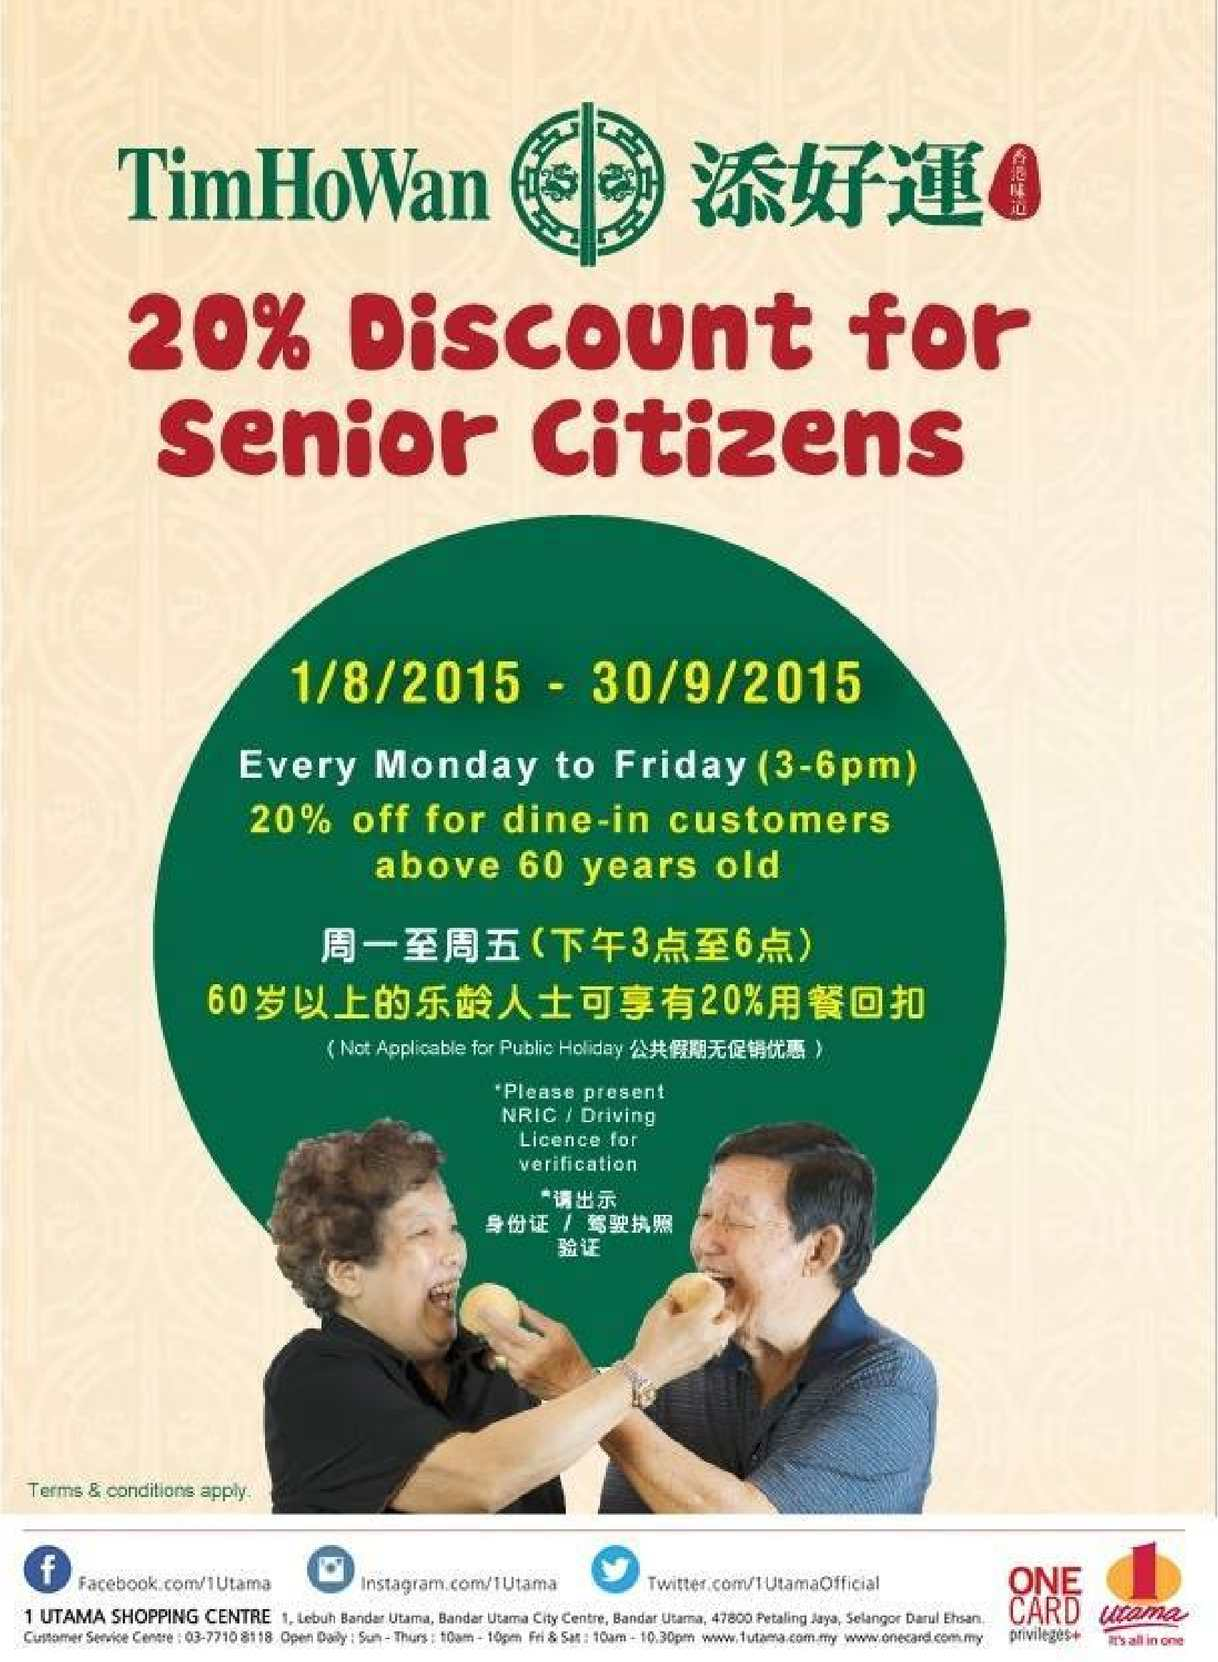 Calameo Tim Ho Wan Malaysia Senior Citizen Promotion At 1 Utama Offer Valid Till September 30 201571541 71541